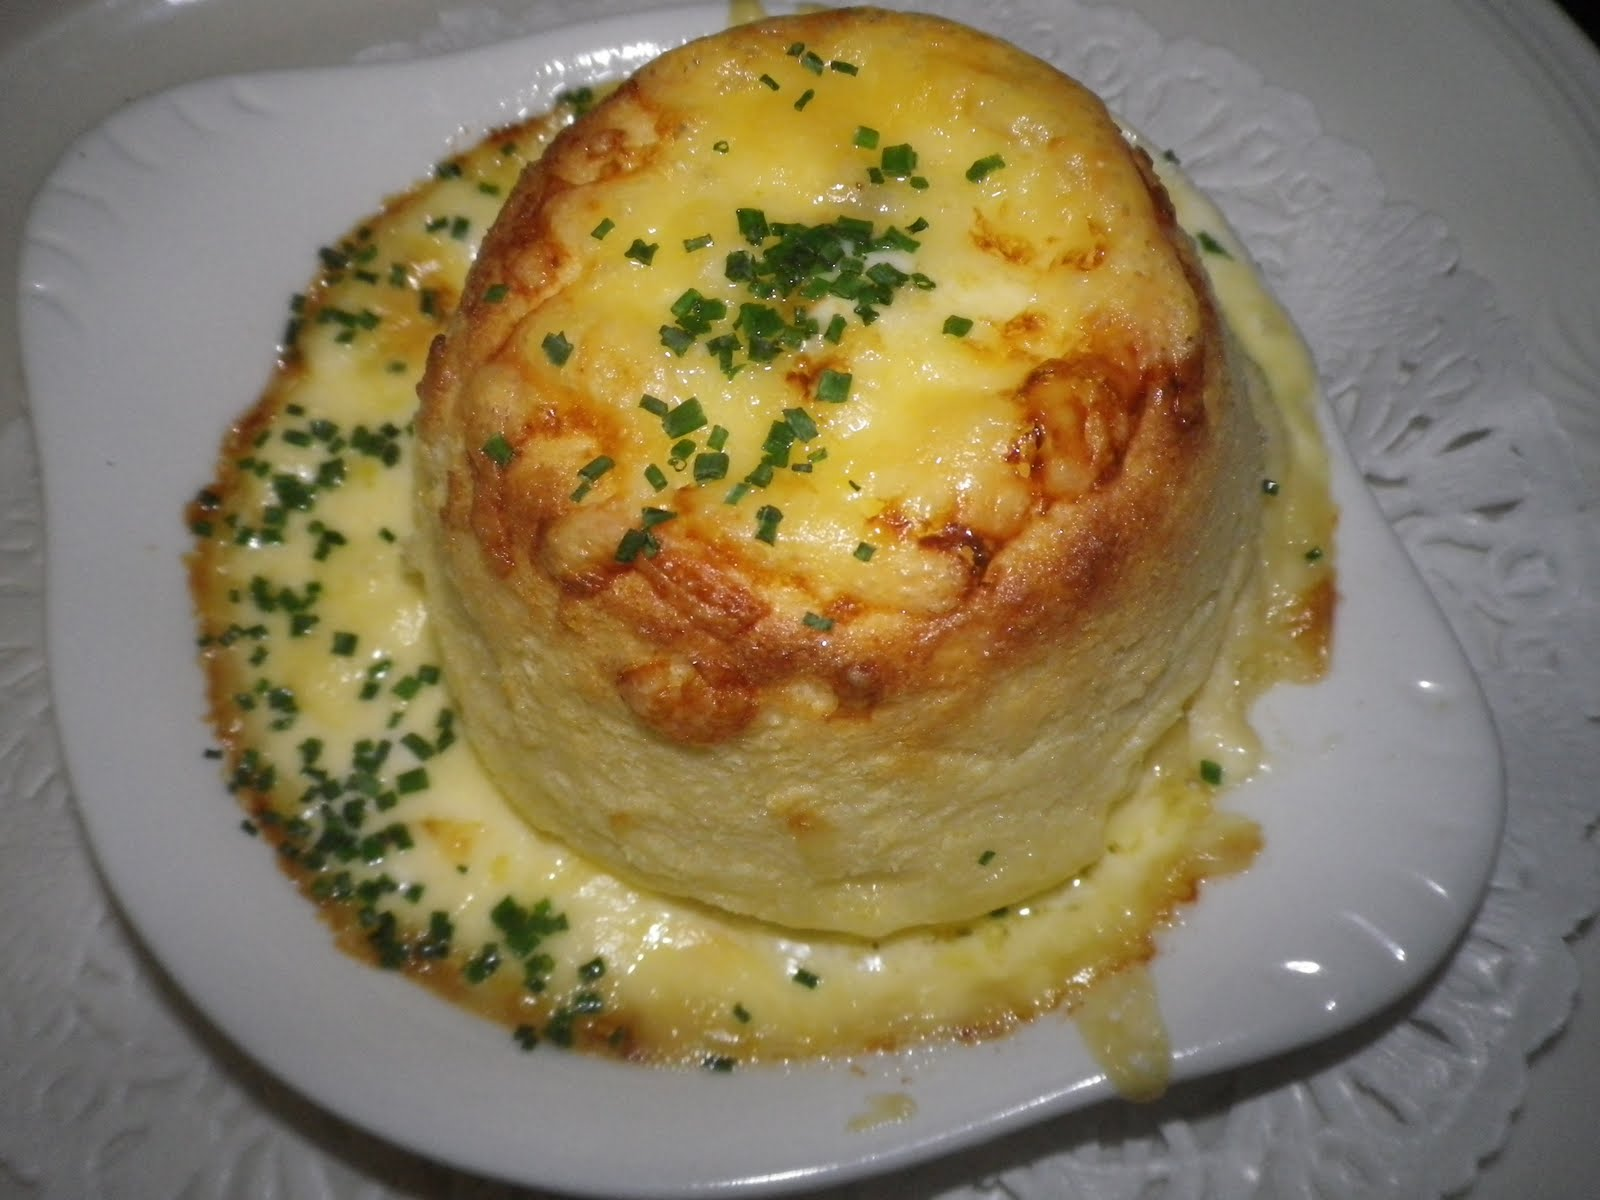 hotel & restaurant: Twice Baked Cheese Souffle Recipe